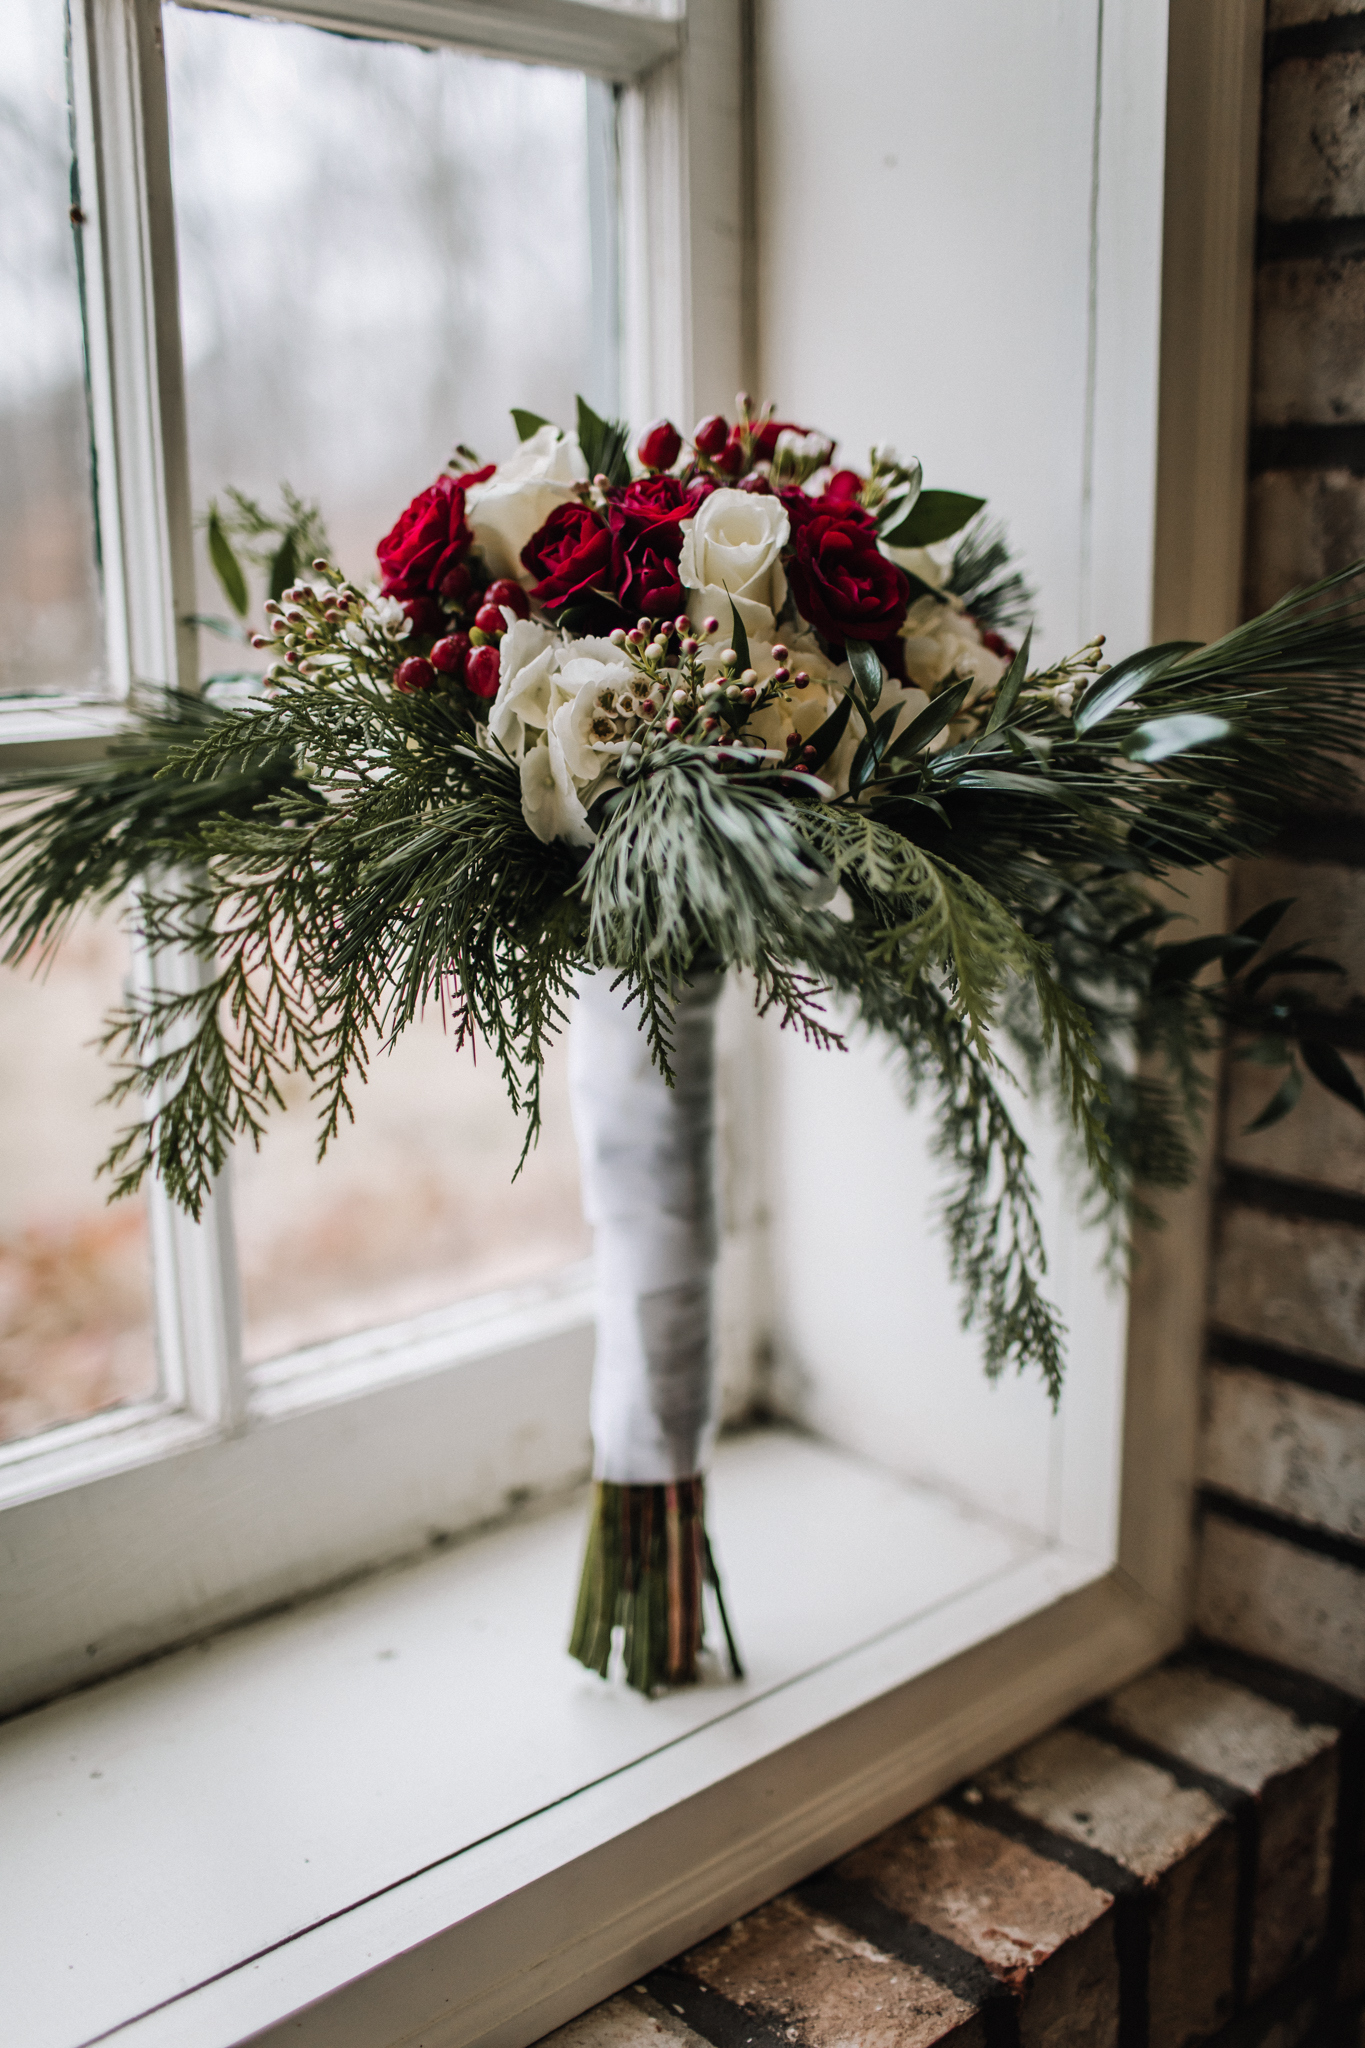 billie-shaye-style-photography-www.billieshayestyle.com-winter-wedding-the-belle-hollow-clarksville-tennessee-8878.jpg